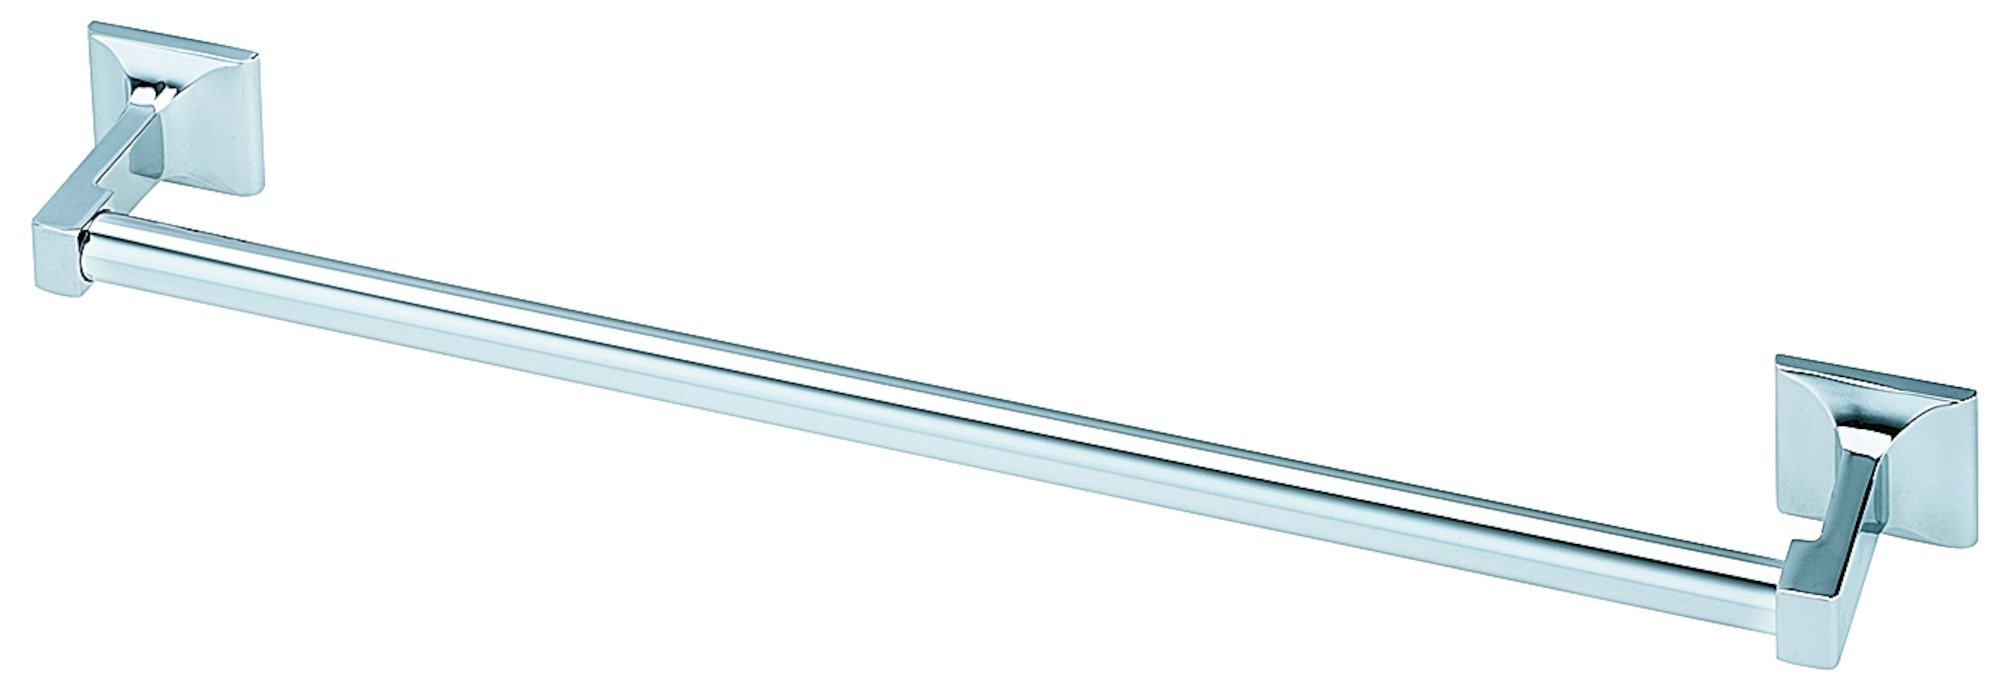 Towel Bars Chrome 926 | Accurate Door & Hardware, Inc.